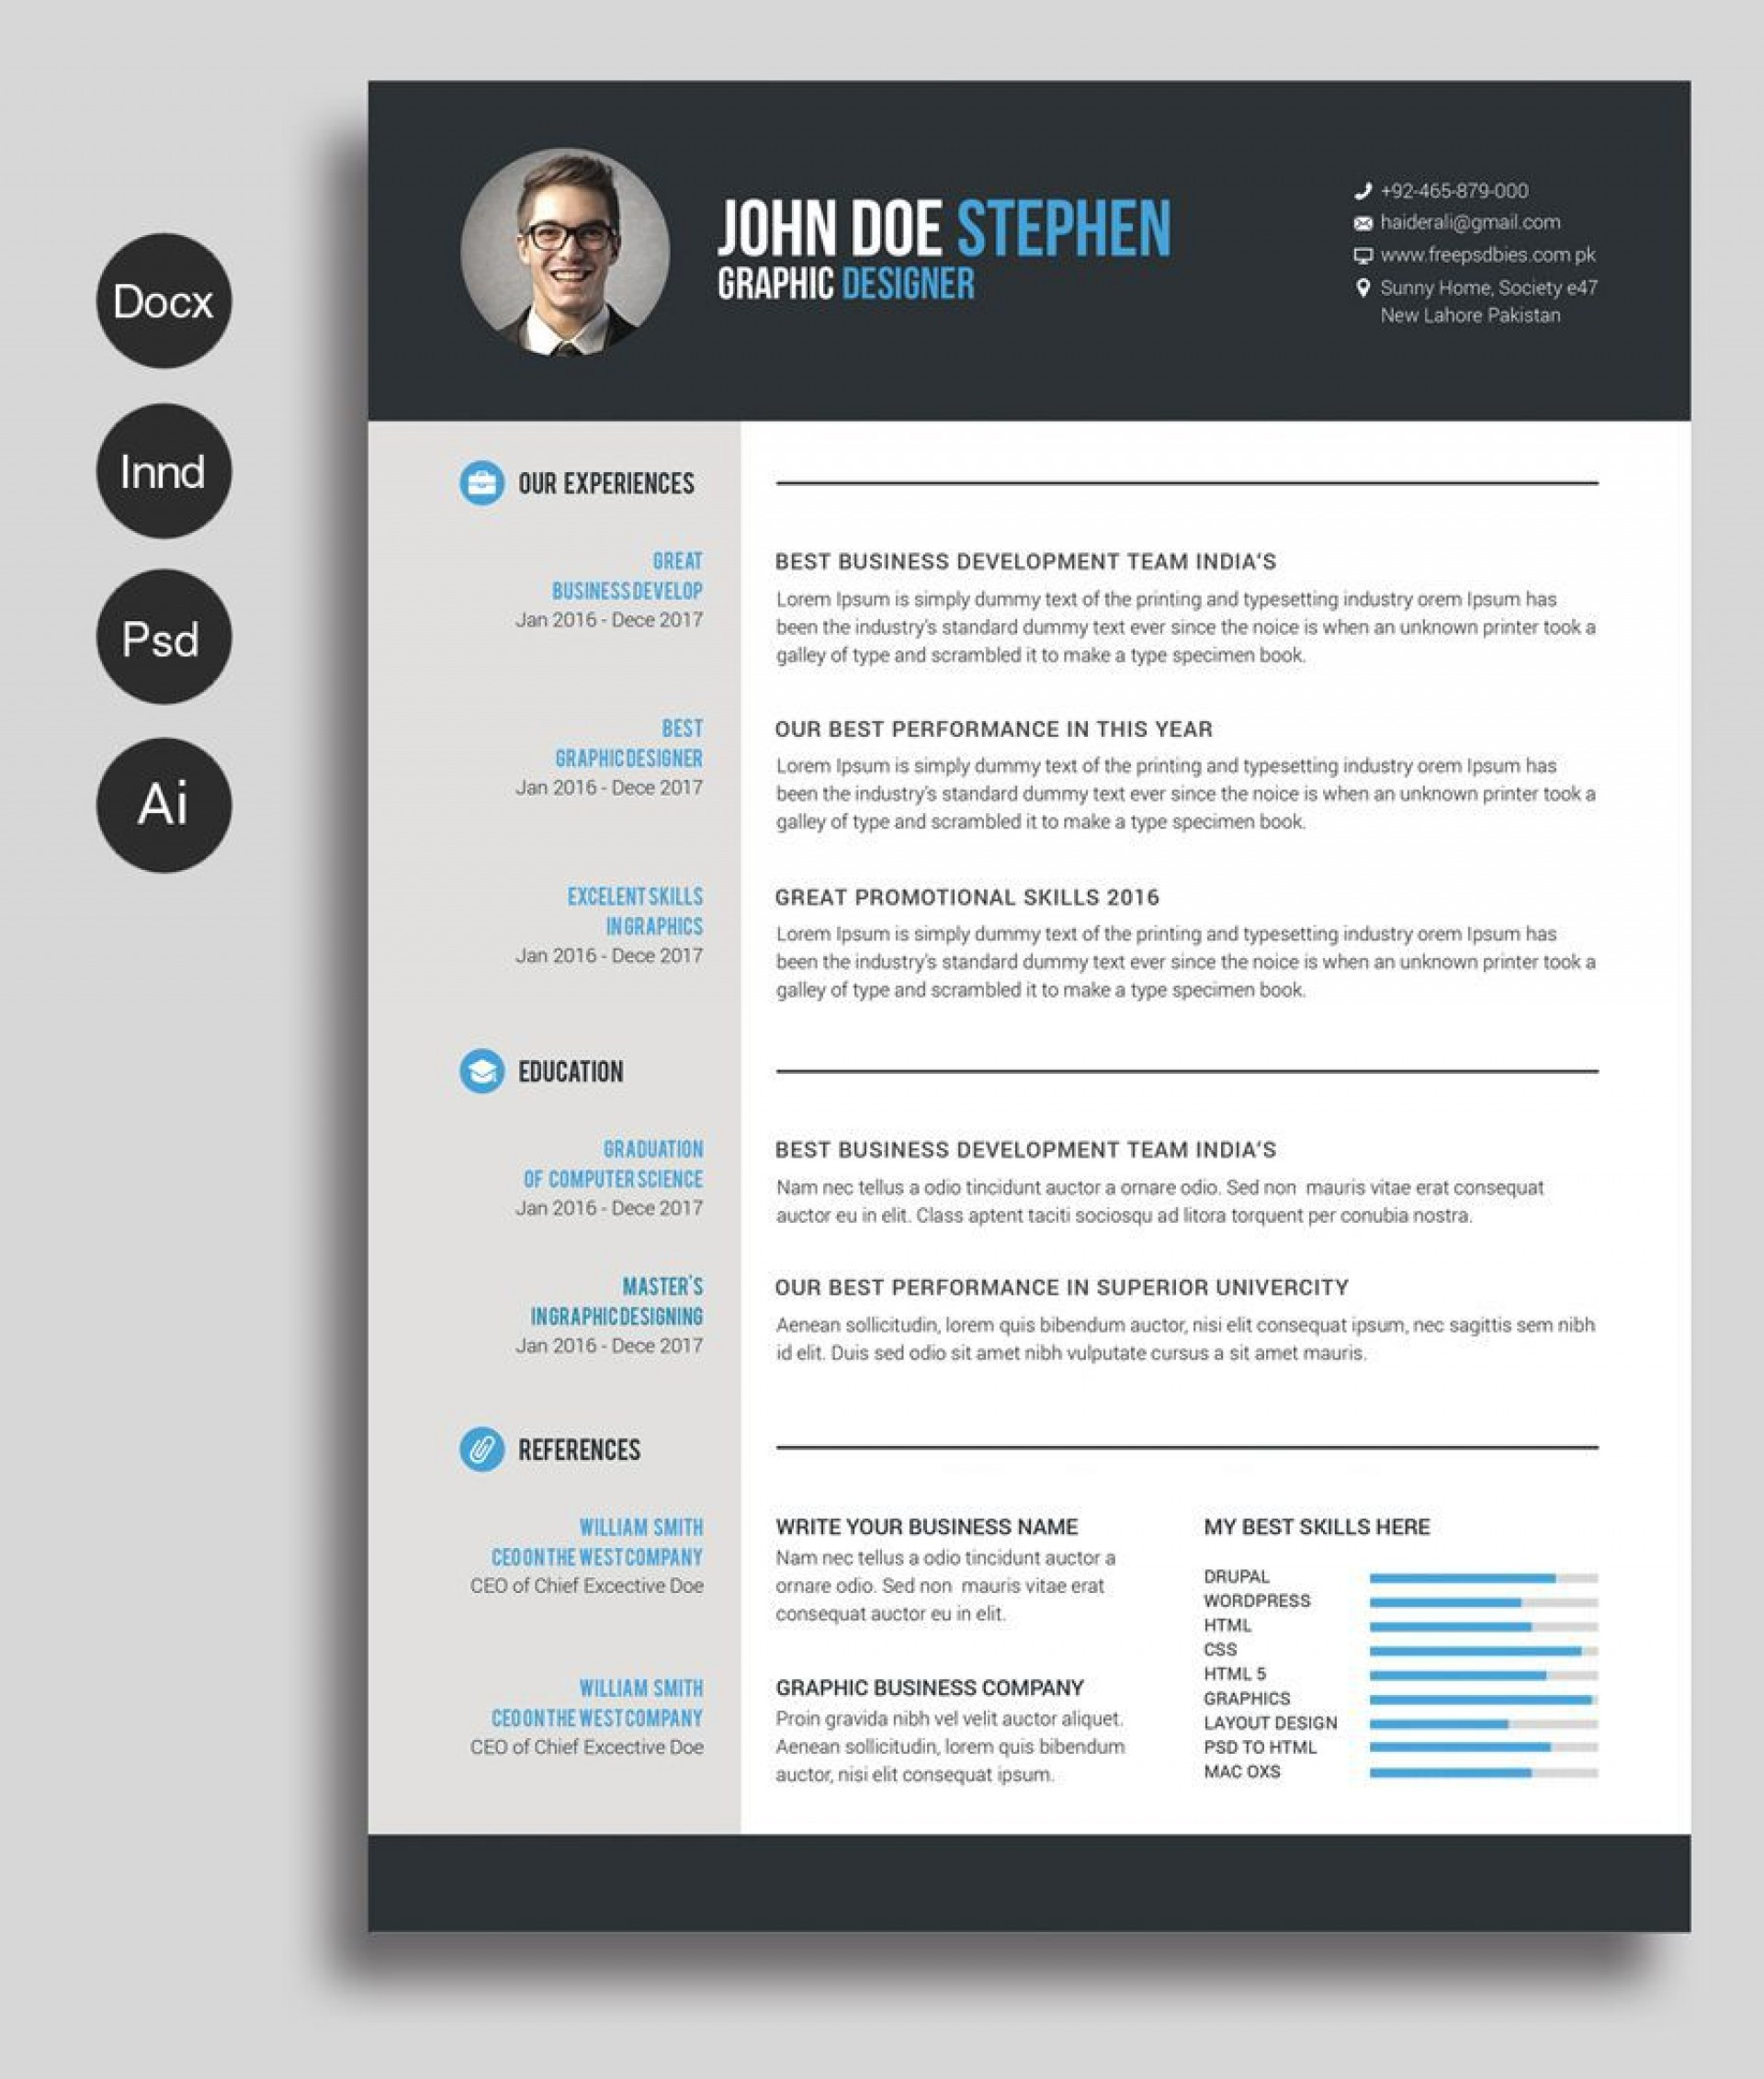 001 Top Free Resume Template Microsoft Word 2010 High Def  Cv Download1920